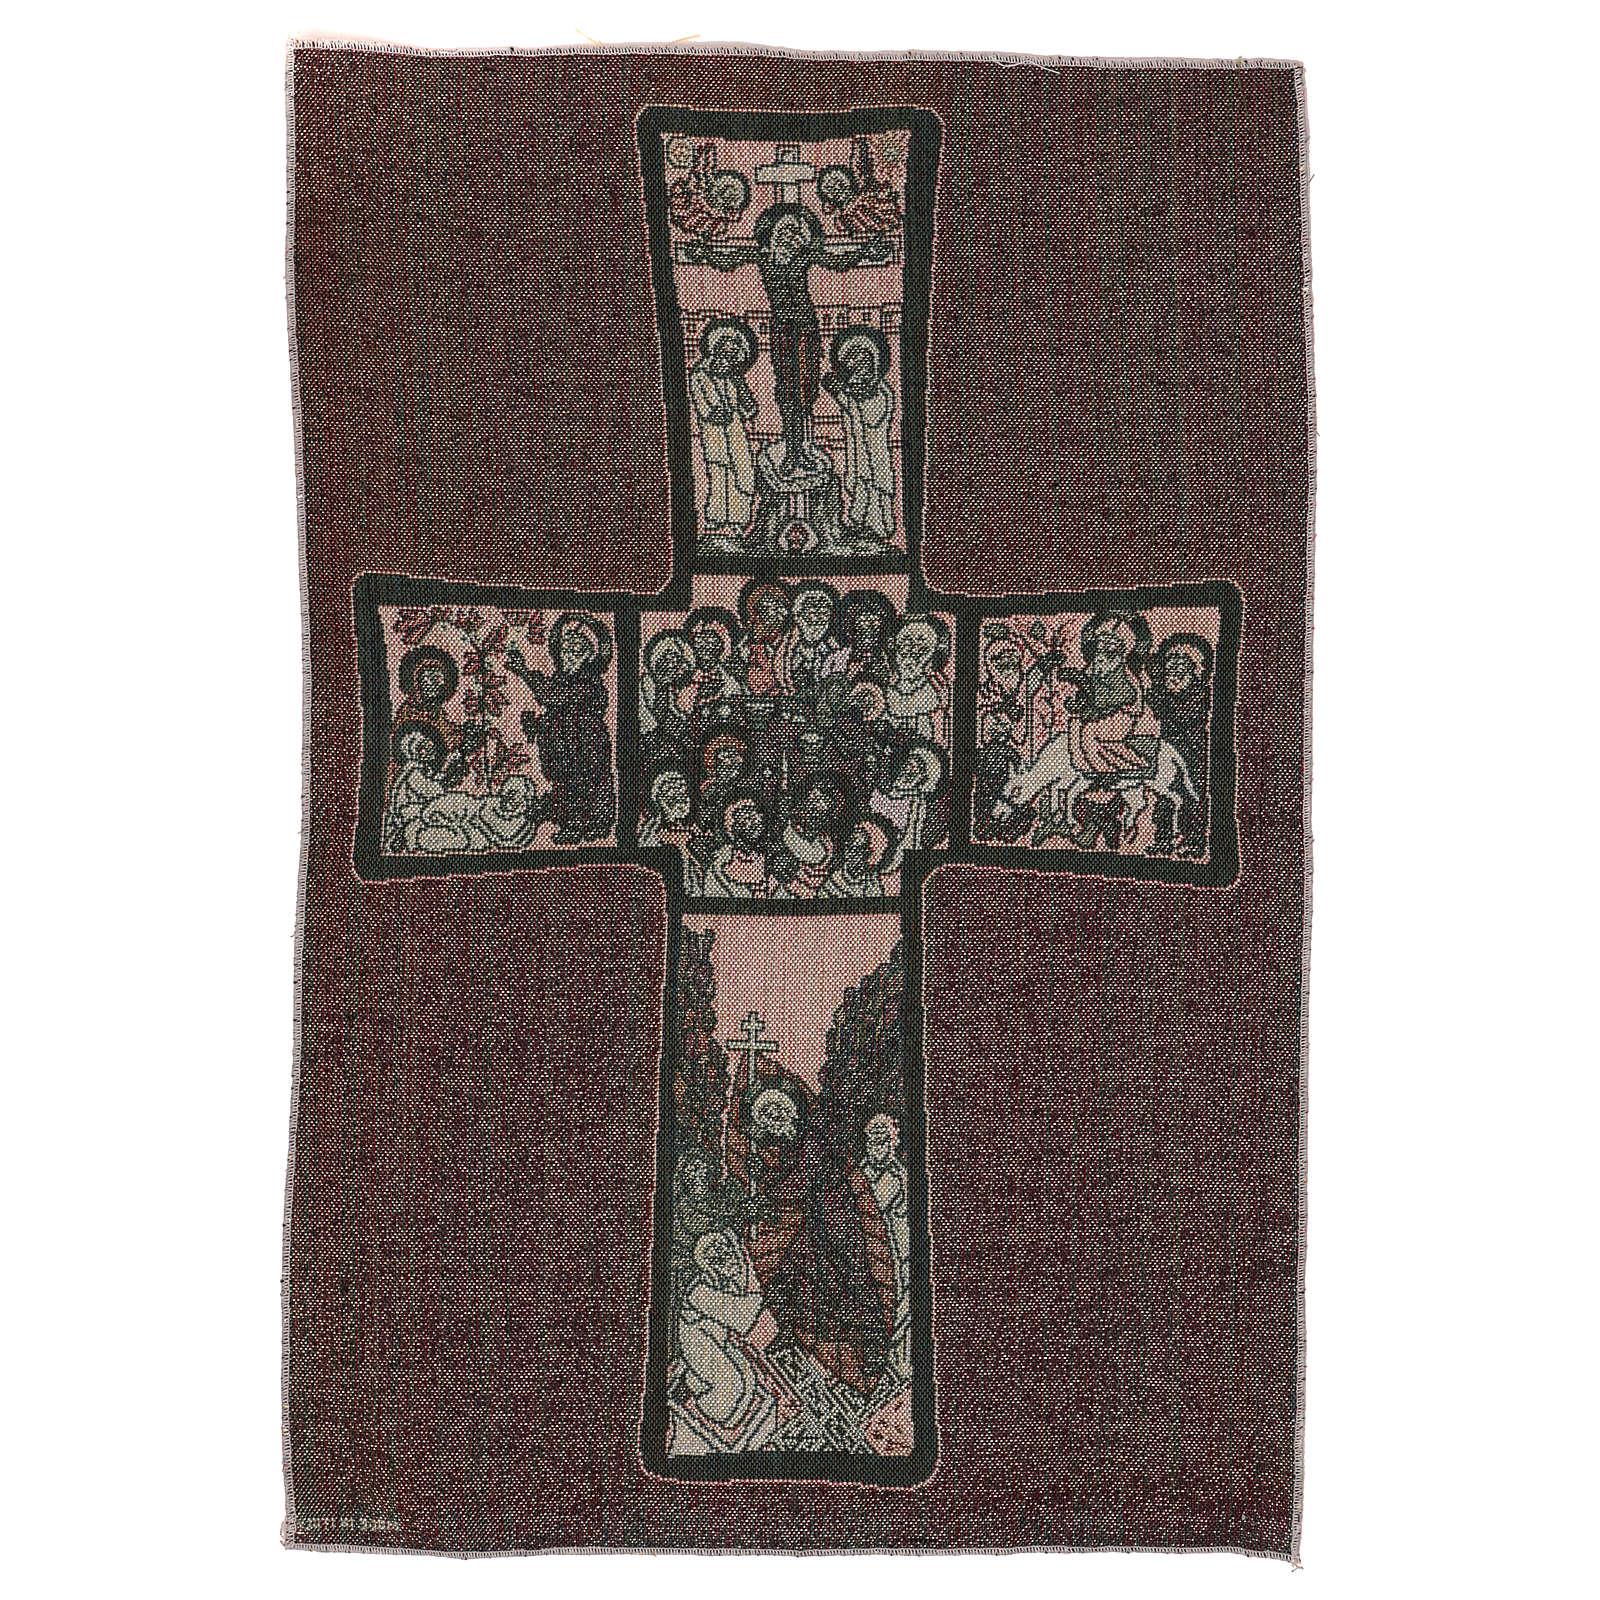 Life of Christ cross tapestry 22x15